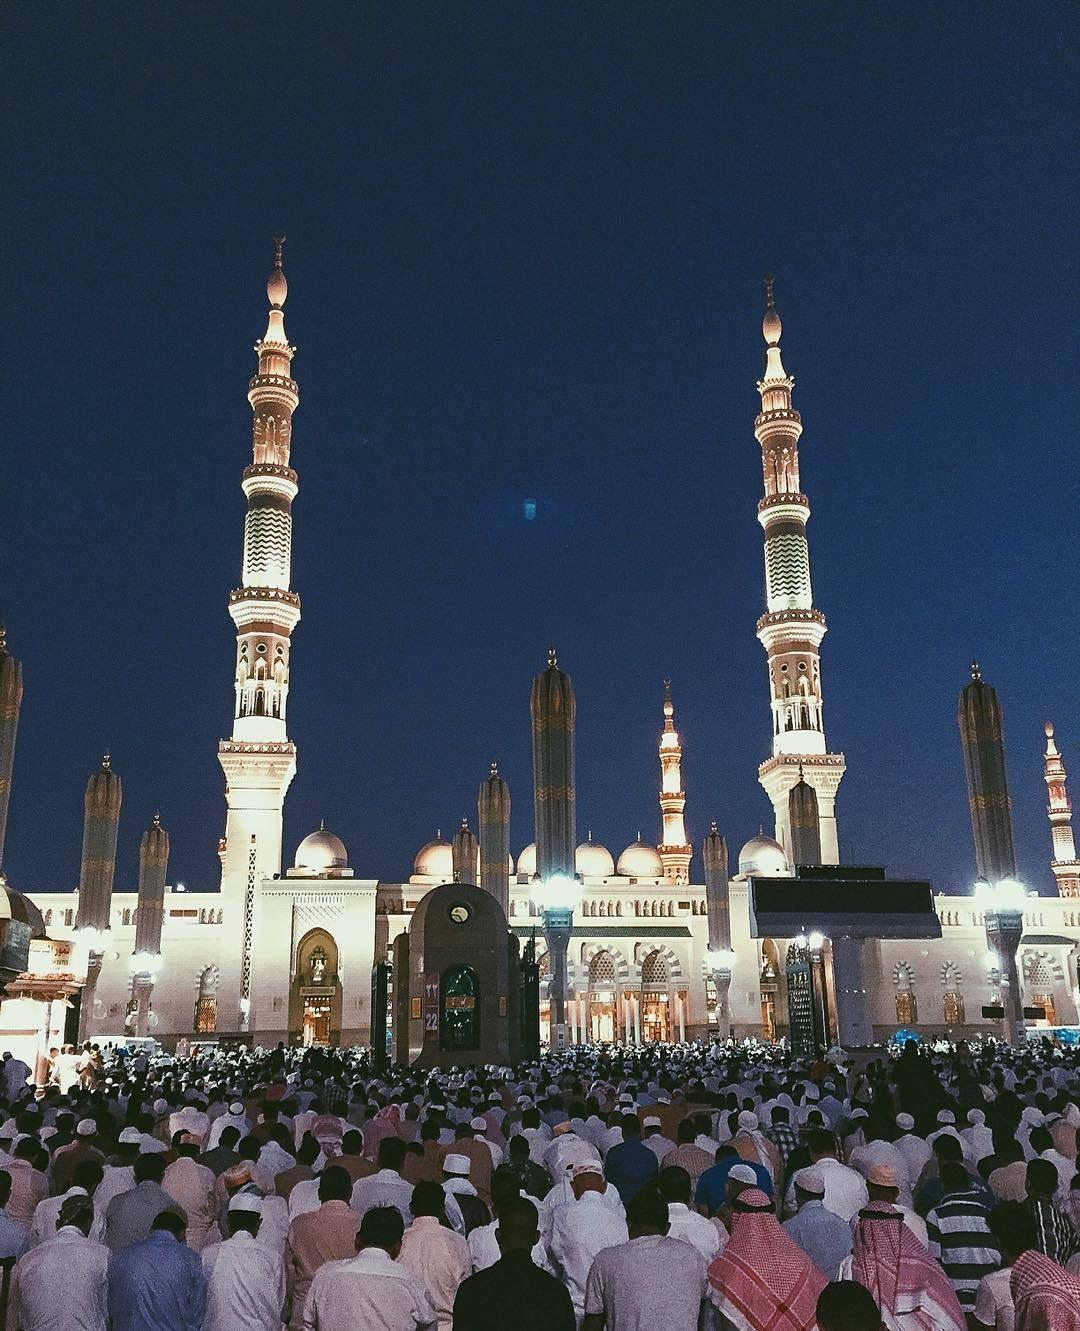 Pin By Naiceeee Naice On Mekke Medine Kudus Medina Mosque Beautiful Mosques Islamic Architecture